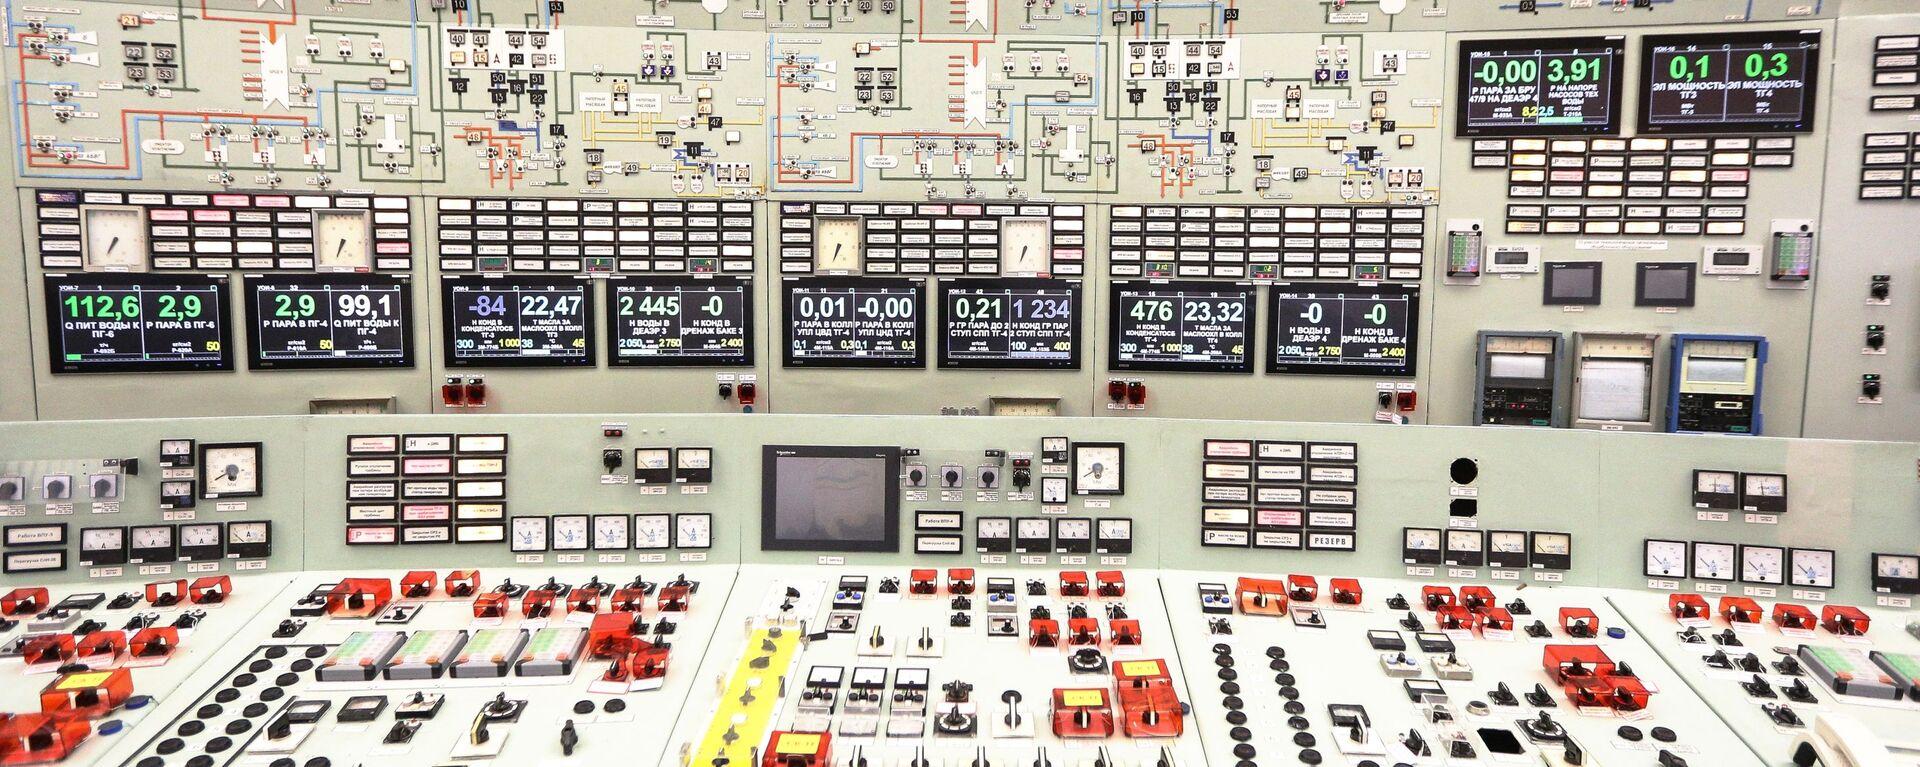 La panel de control de la Central nuclear de Kola (Rusia) - Sputnik Mundo, 1920, 30.06.2021